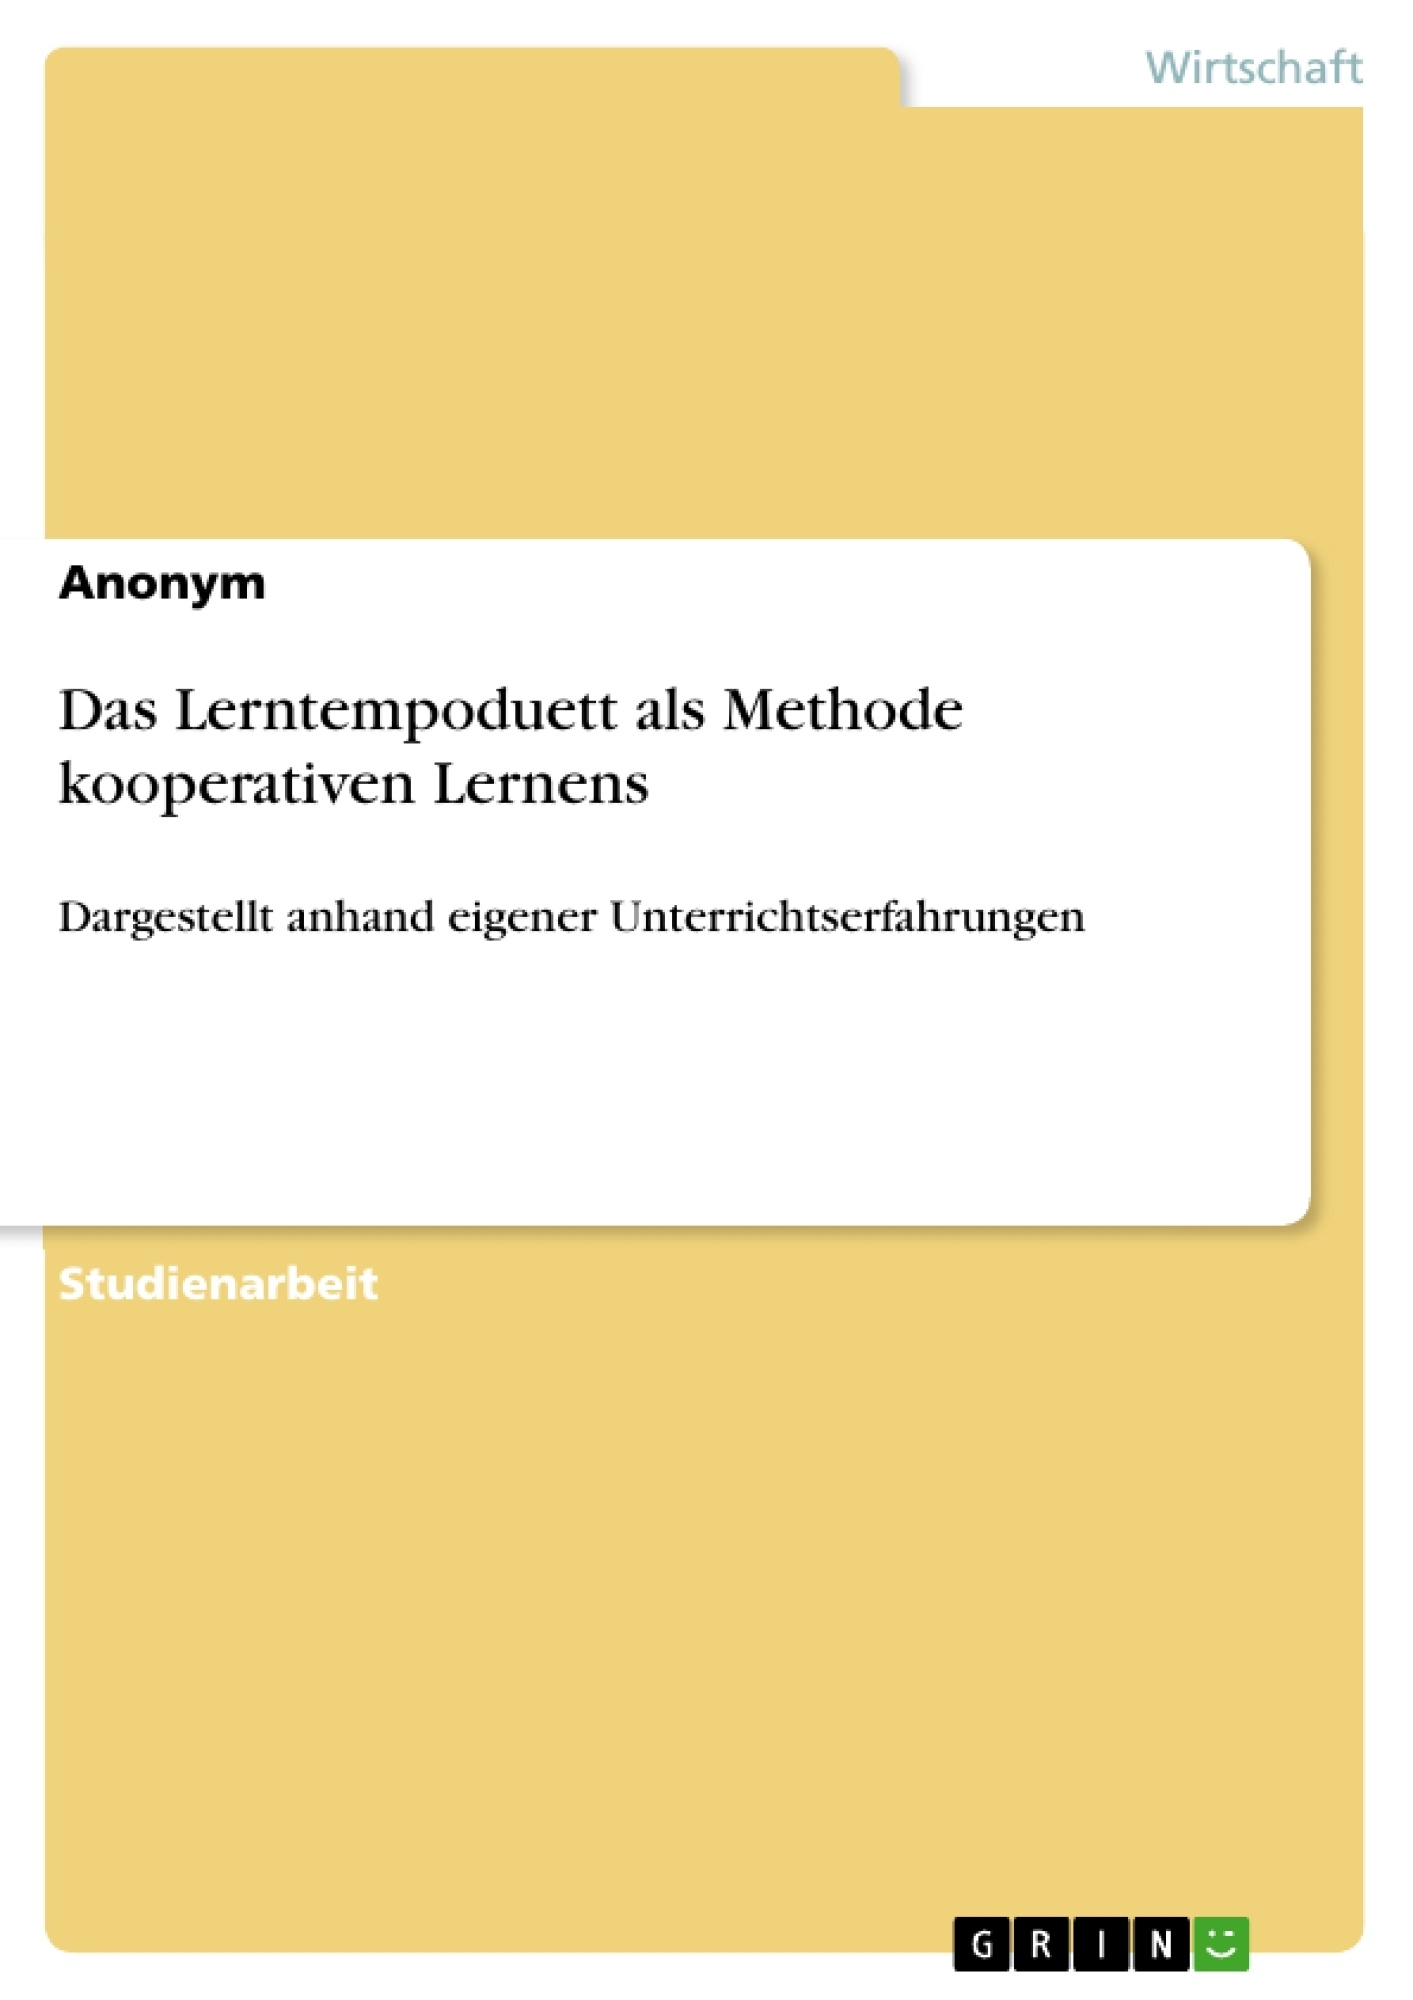 Titel: Das Lerntempoduett als Methode kooperativen Lernens